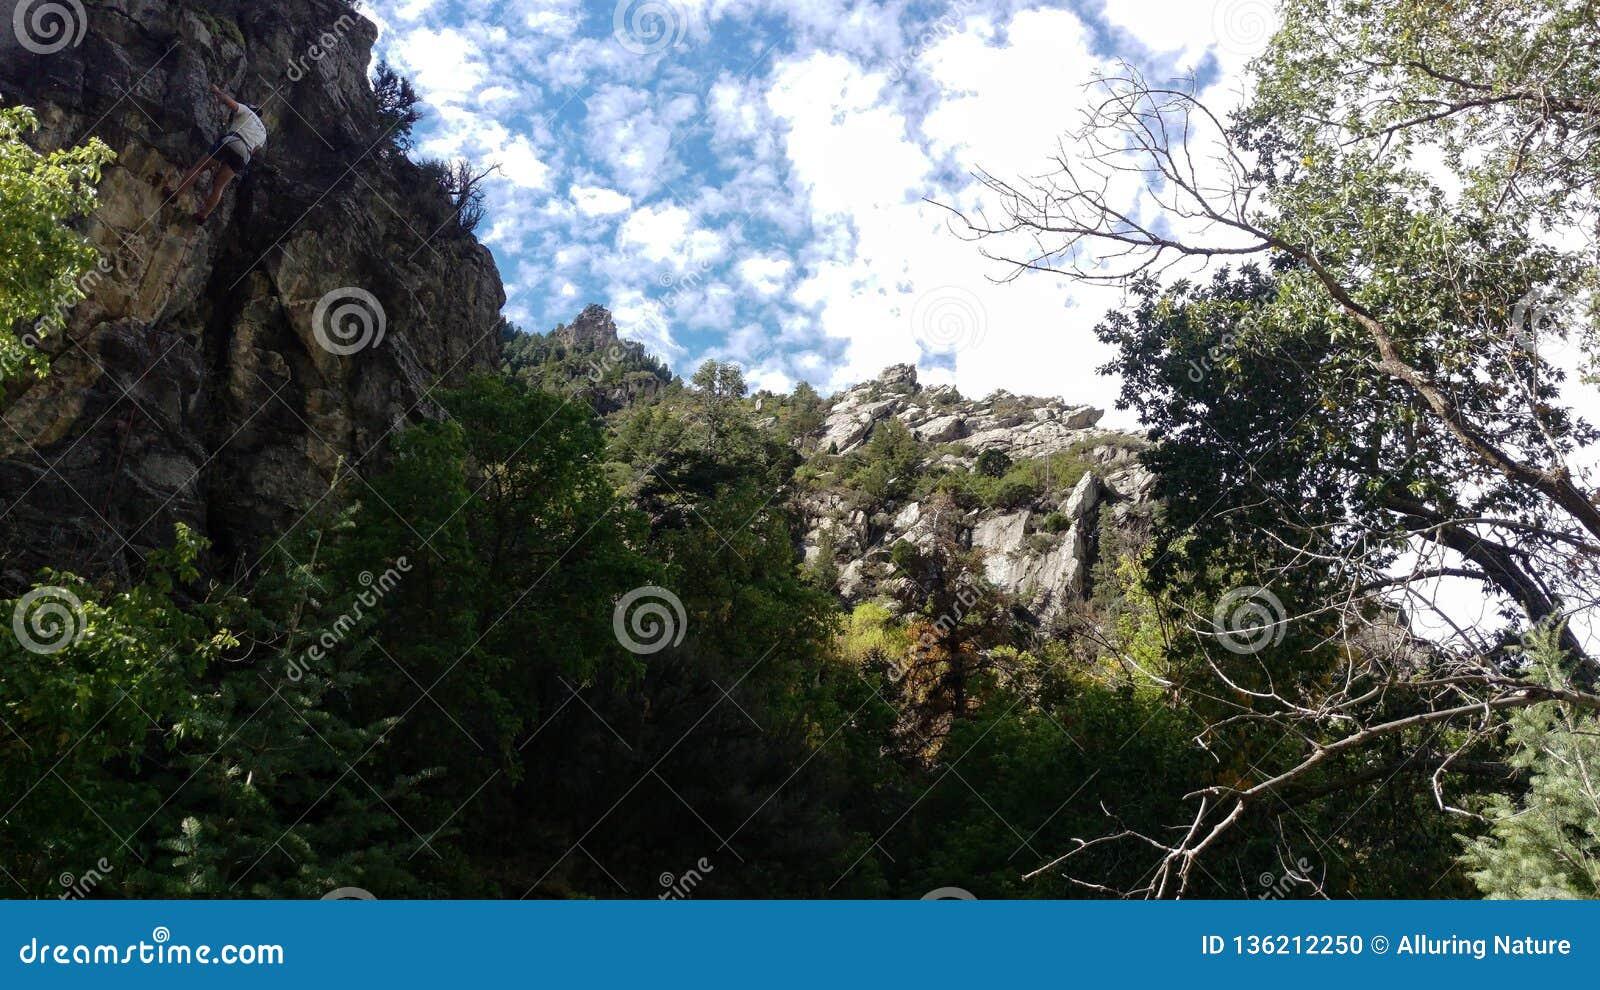 Climbing Cliffs in Rock Canyon